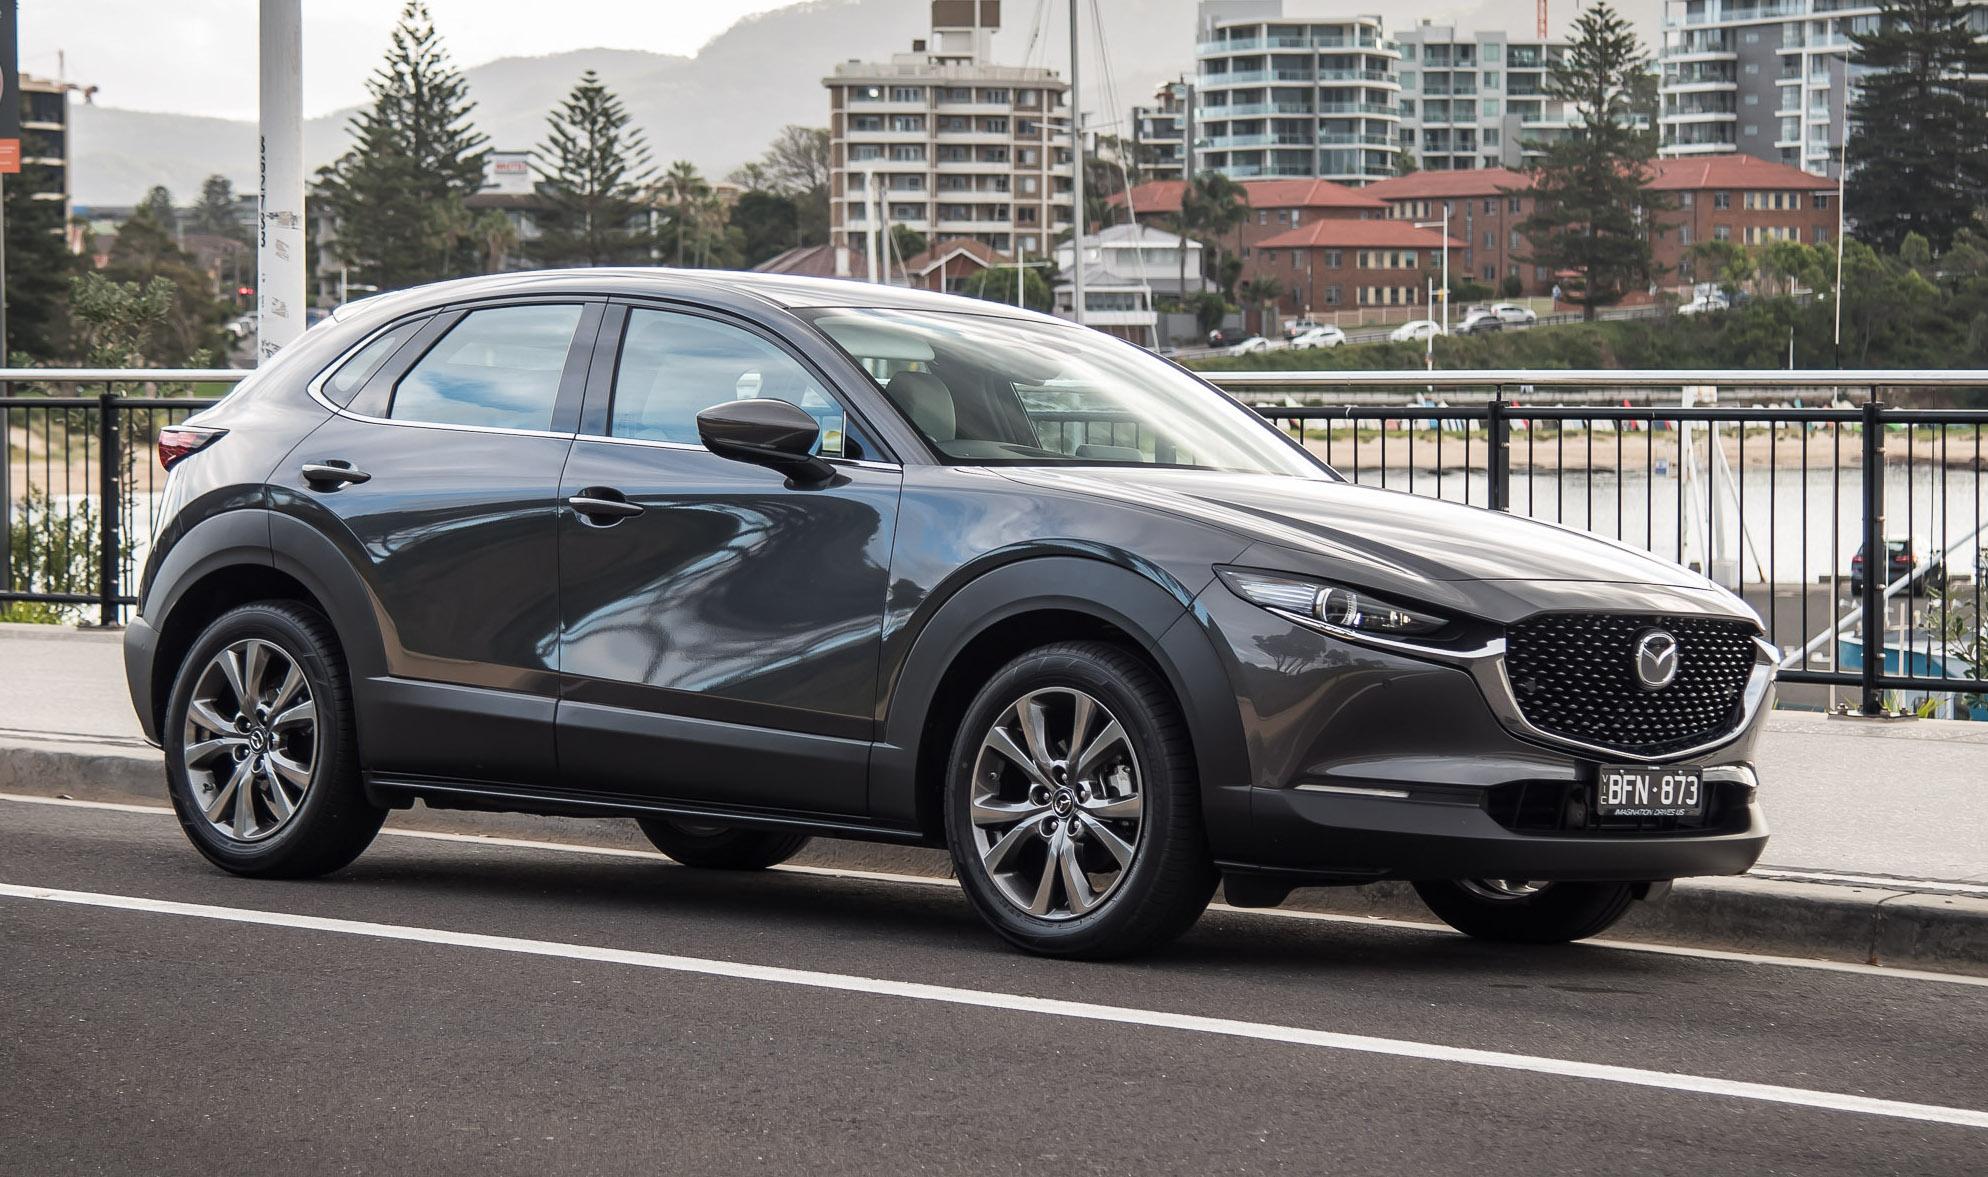 2020 Mazda CX-30 G25 Astina review (video)